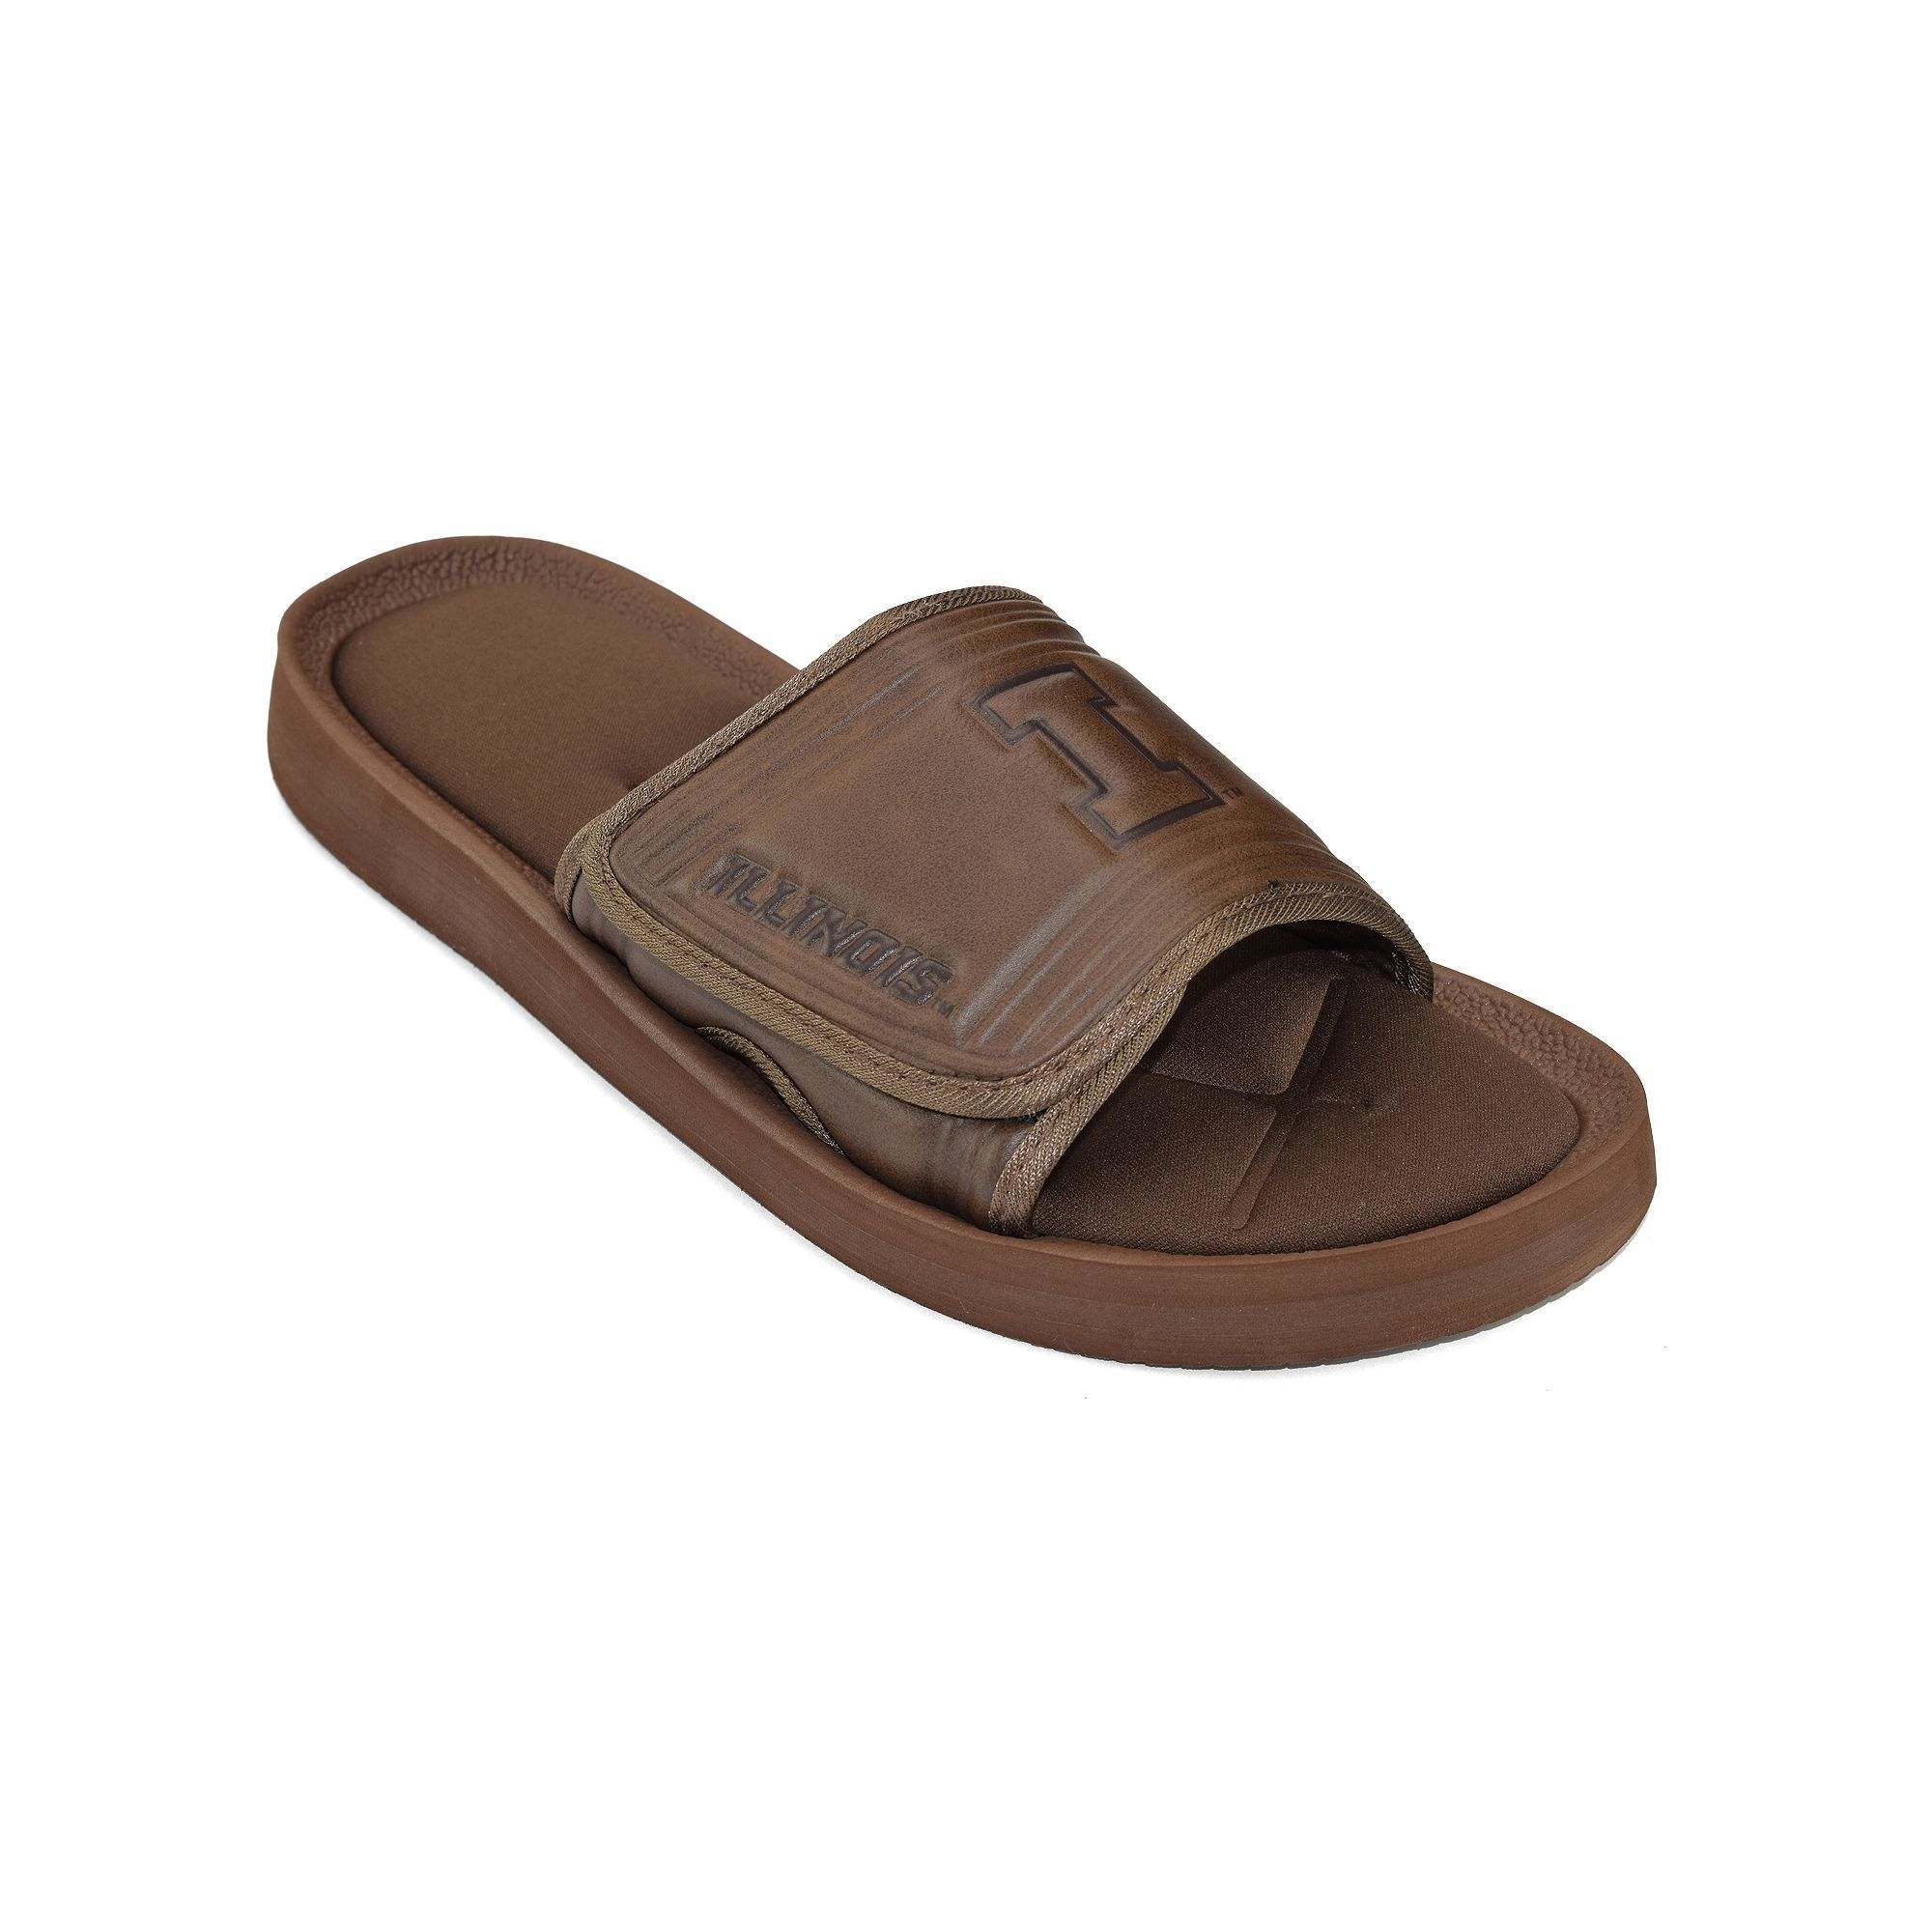 Adult Illinois Fighting Illini Memory Foam Slide Sandals Mens Size Medium Brown